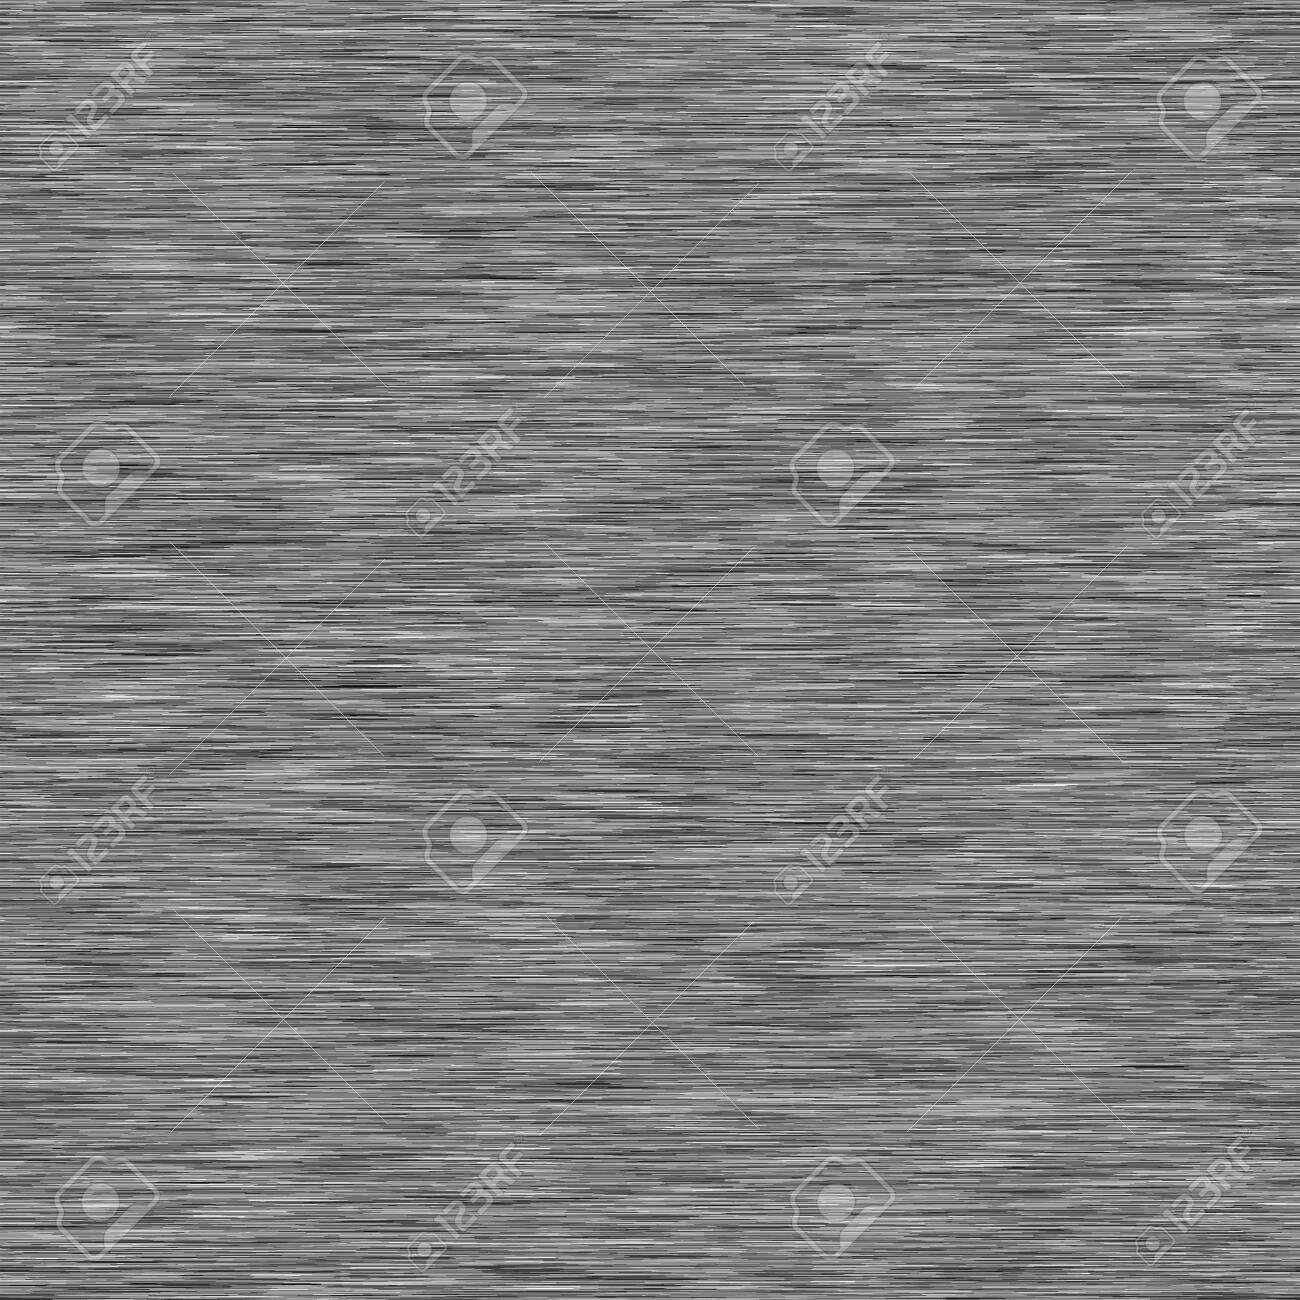 Gray Marl Heather Melange Seamless Vector Pattern - 134467698